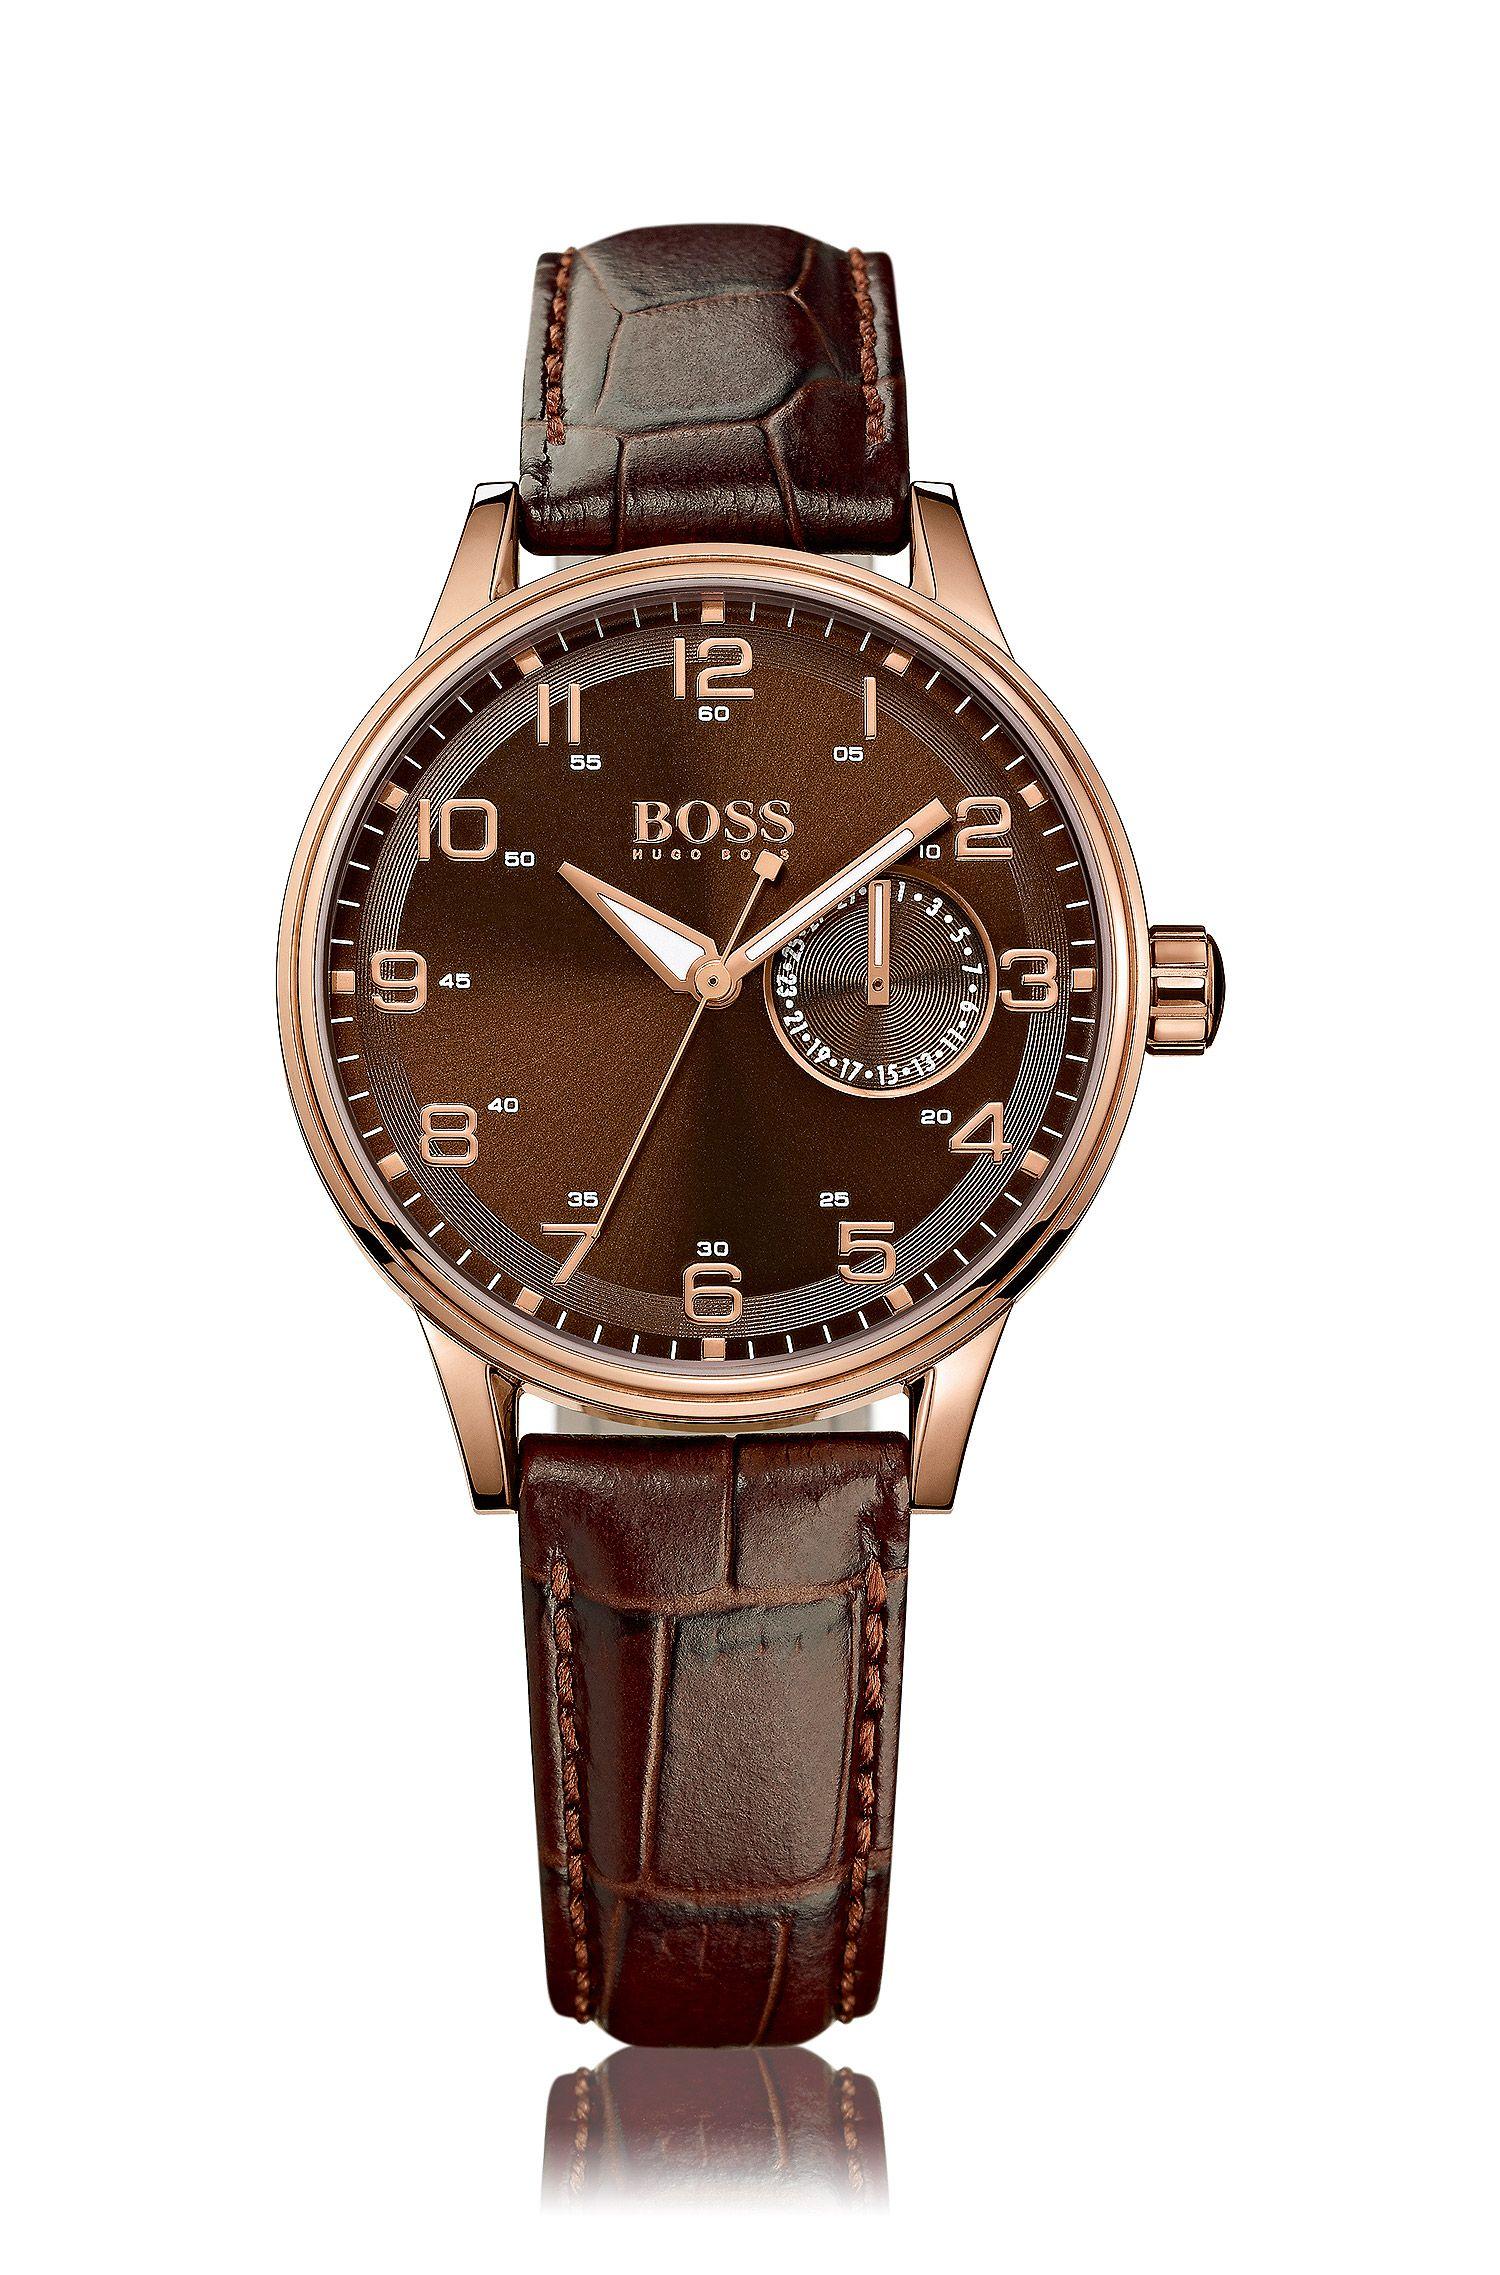 Horloge 'HB5005' met datumaanduiding